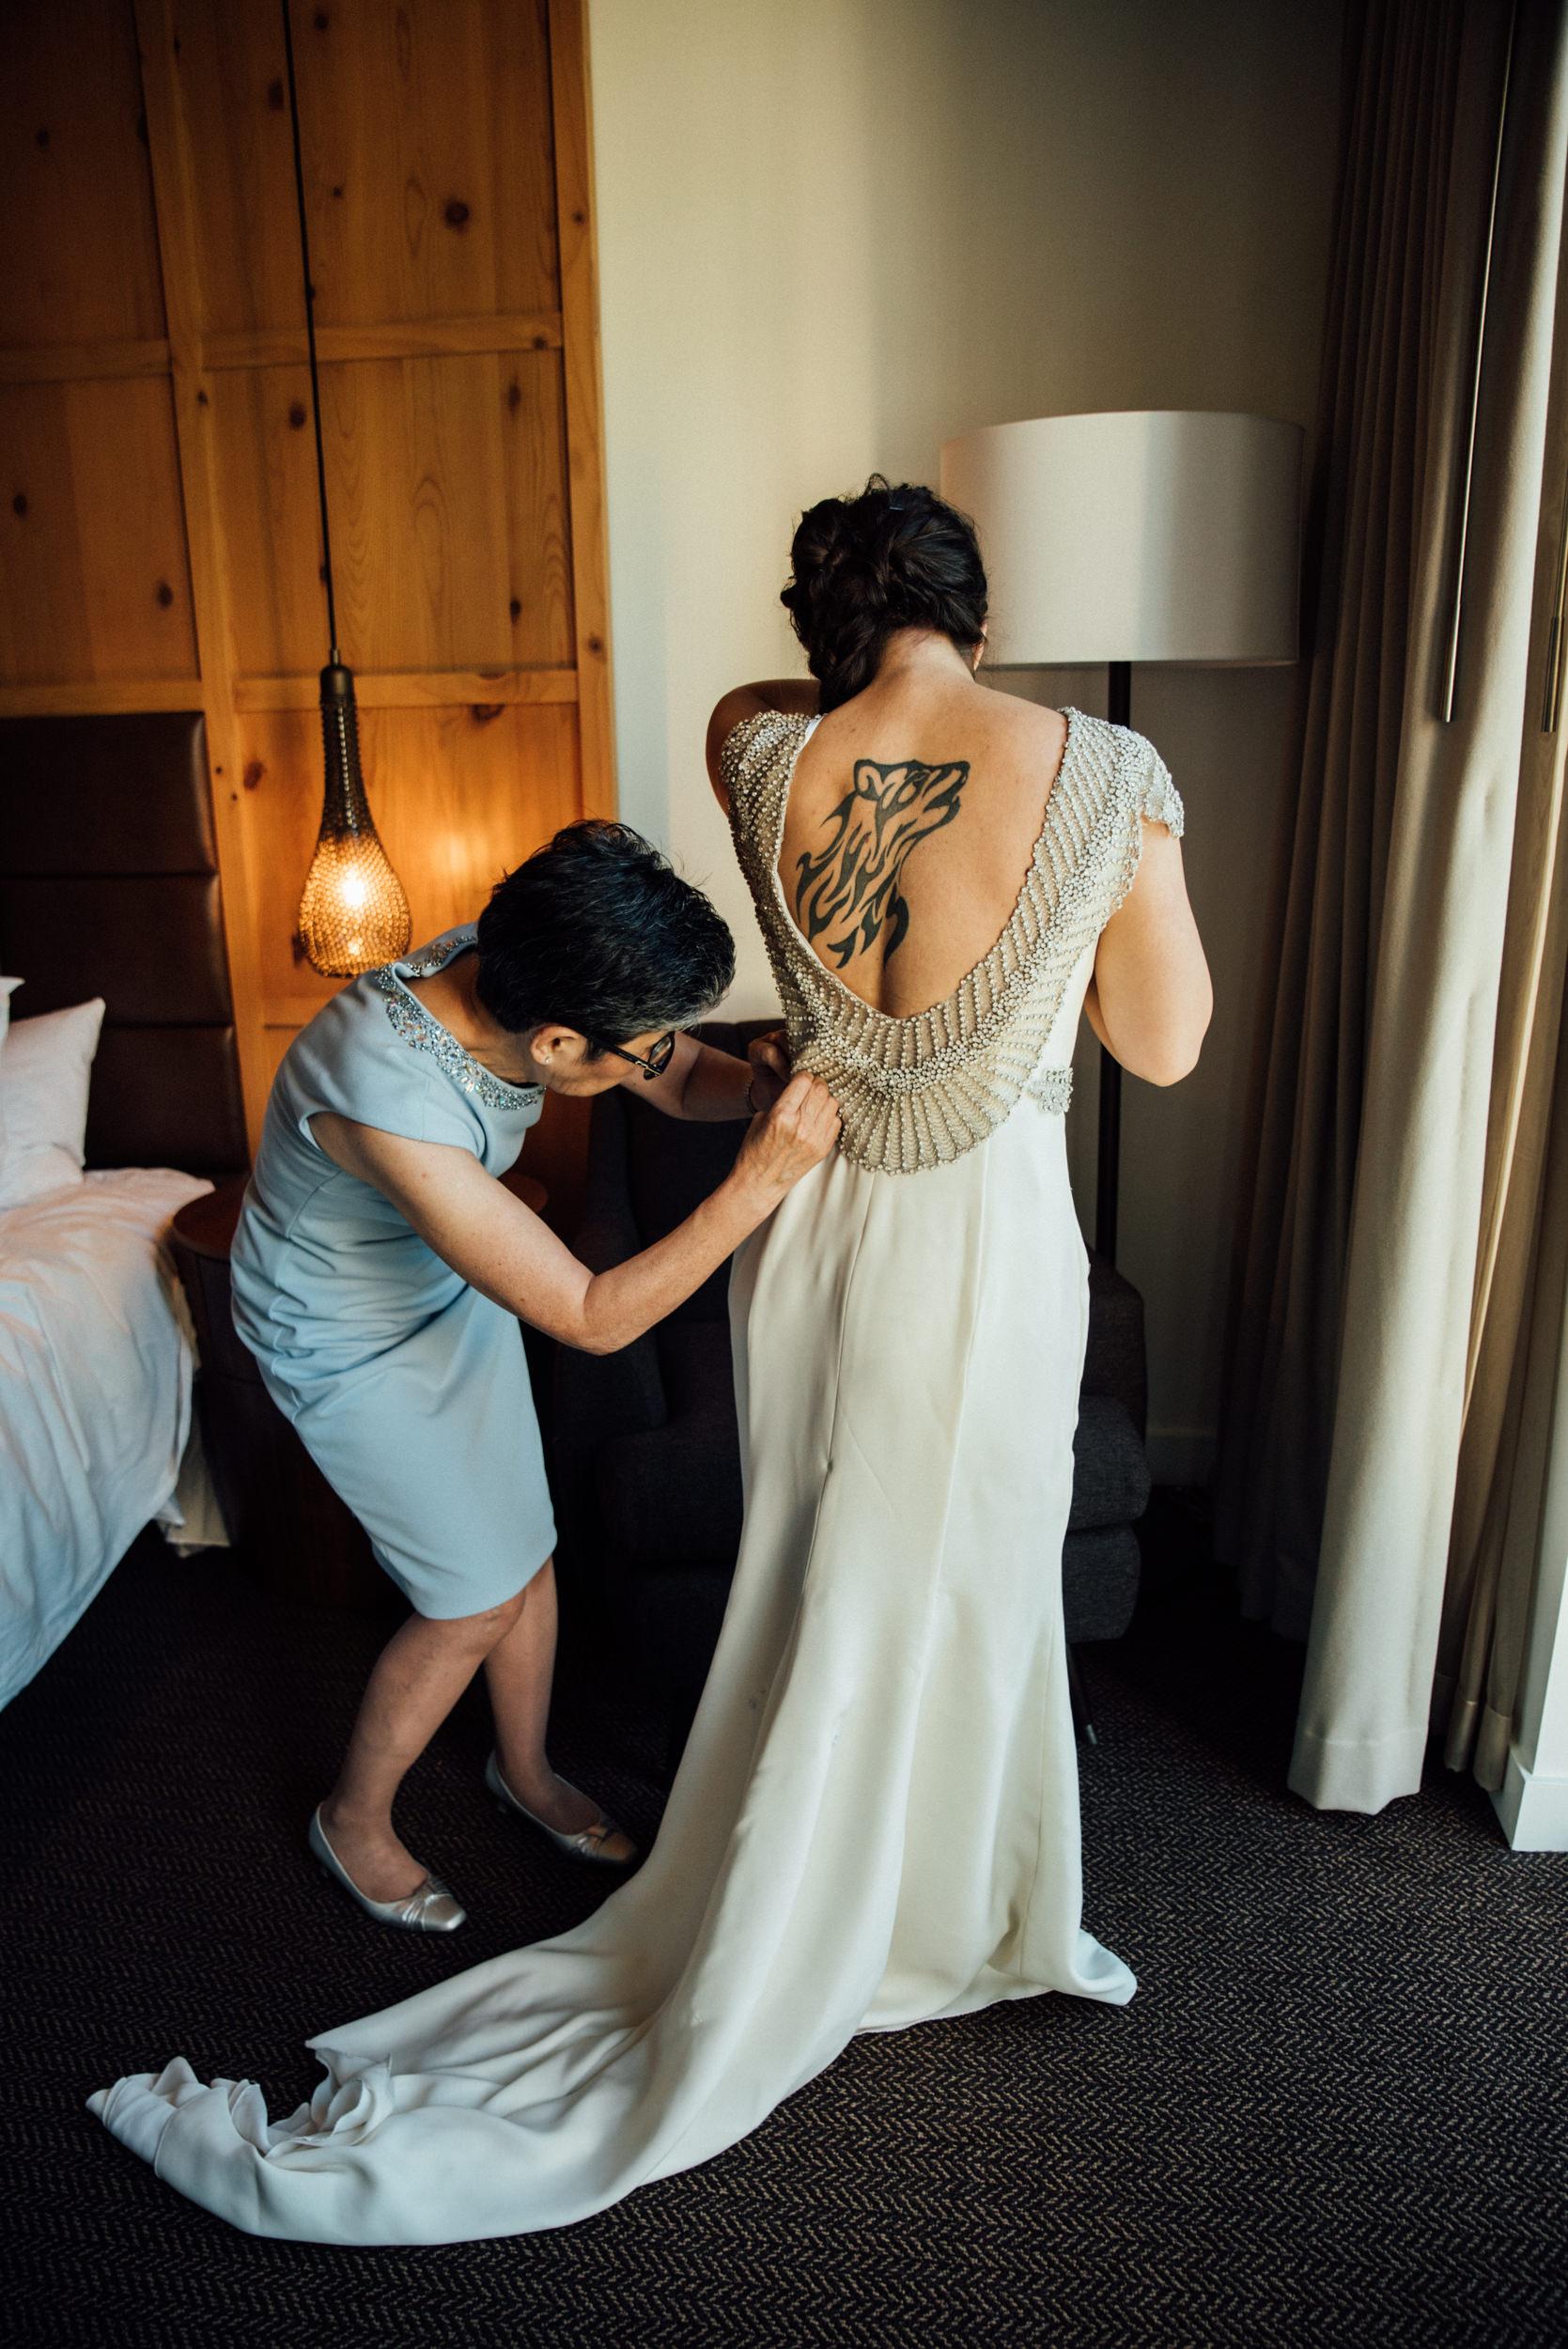 Colorado Denver Downtown Urban Wedding Colorado Wedding Photographer Mom getting Bride Ready